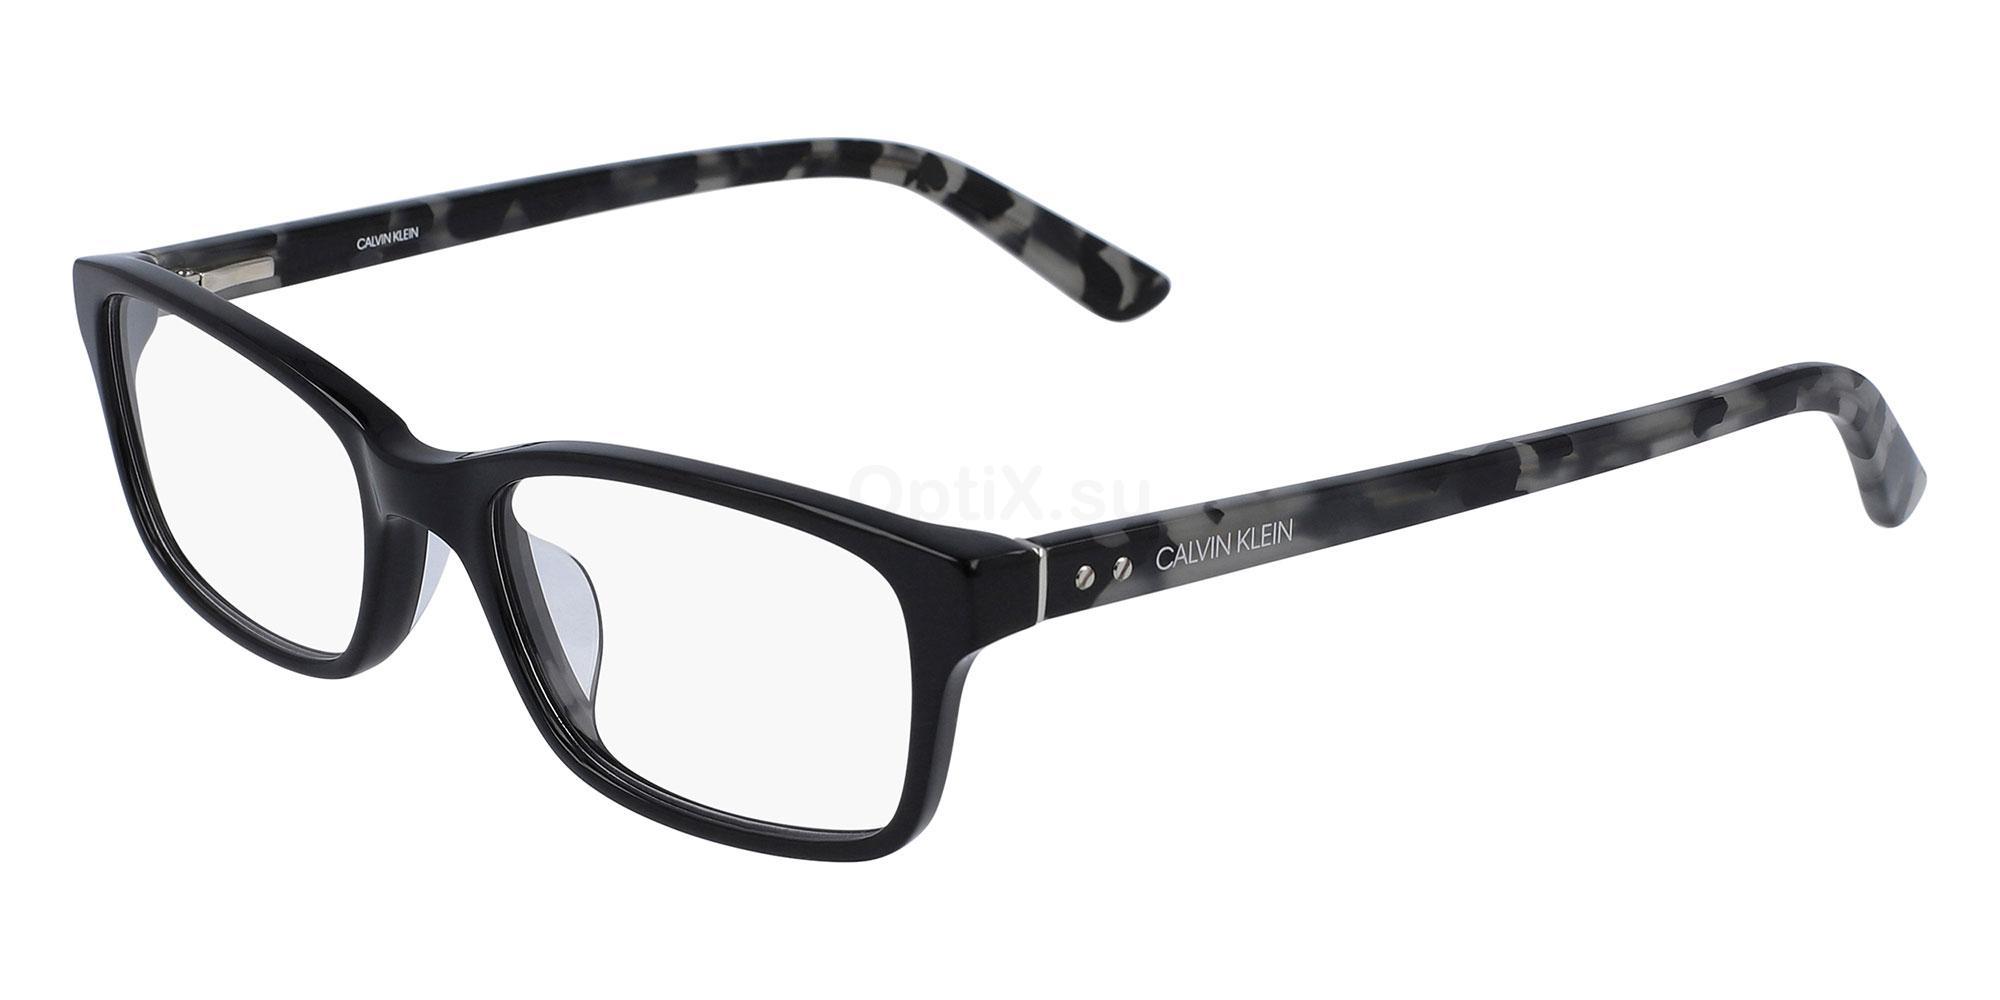 001 CK19518 Glasses, Calvin Klein